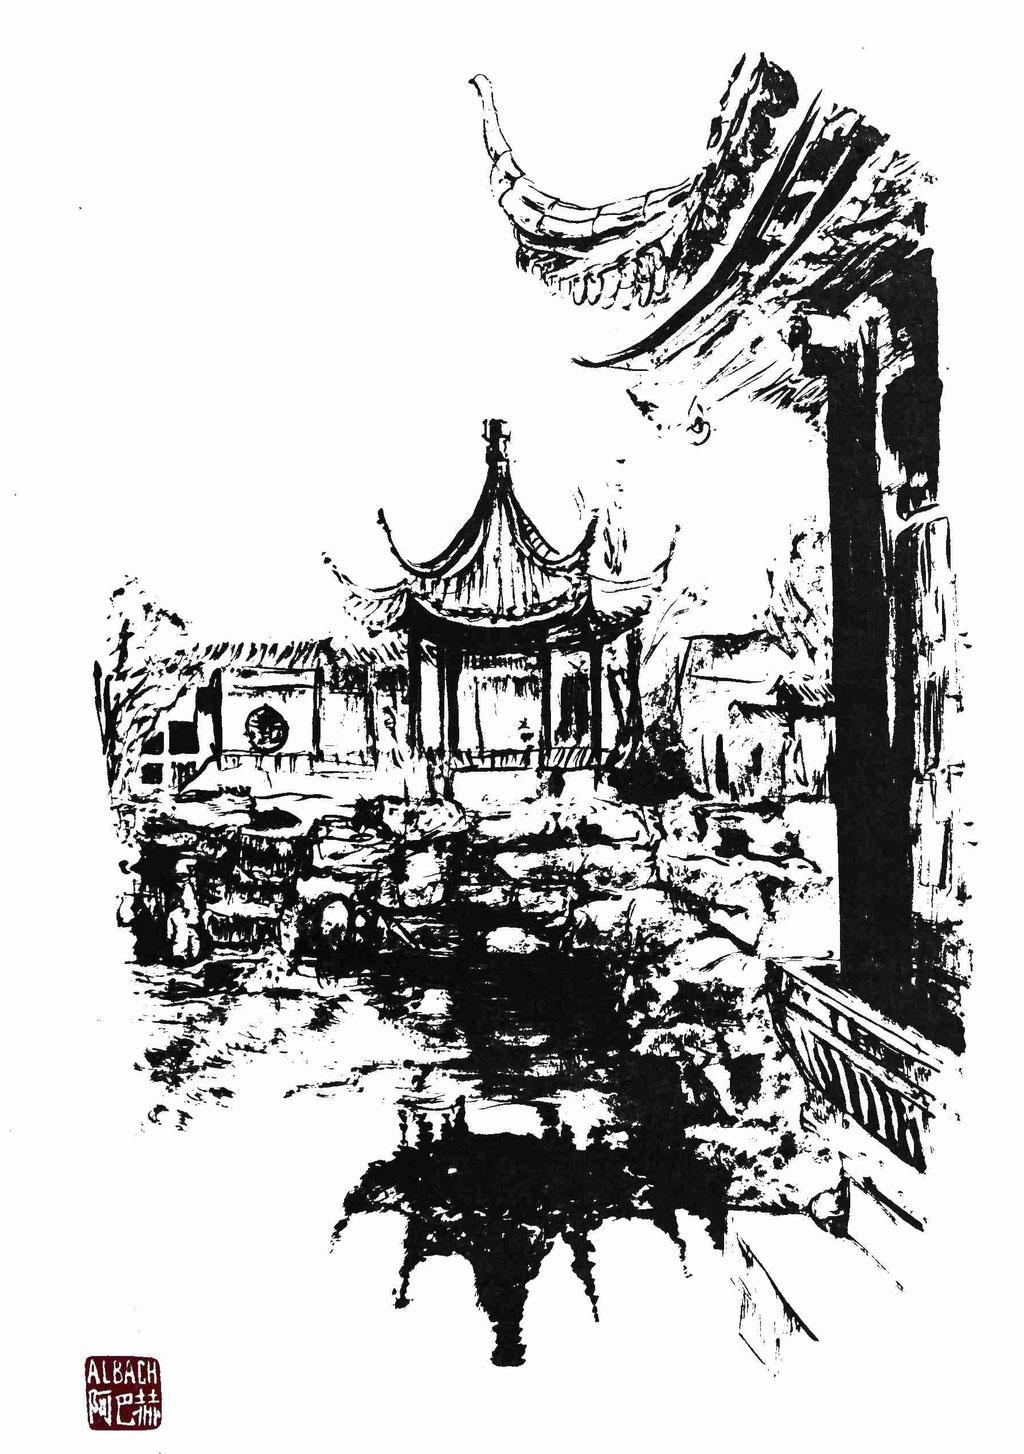 Garten des ewigen Glücks- Pavillon der Freude